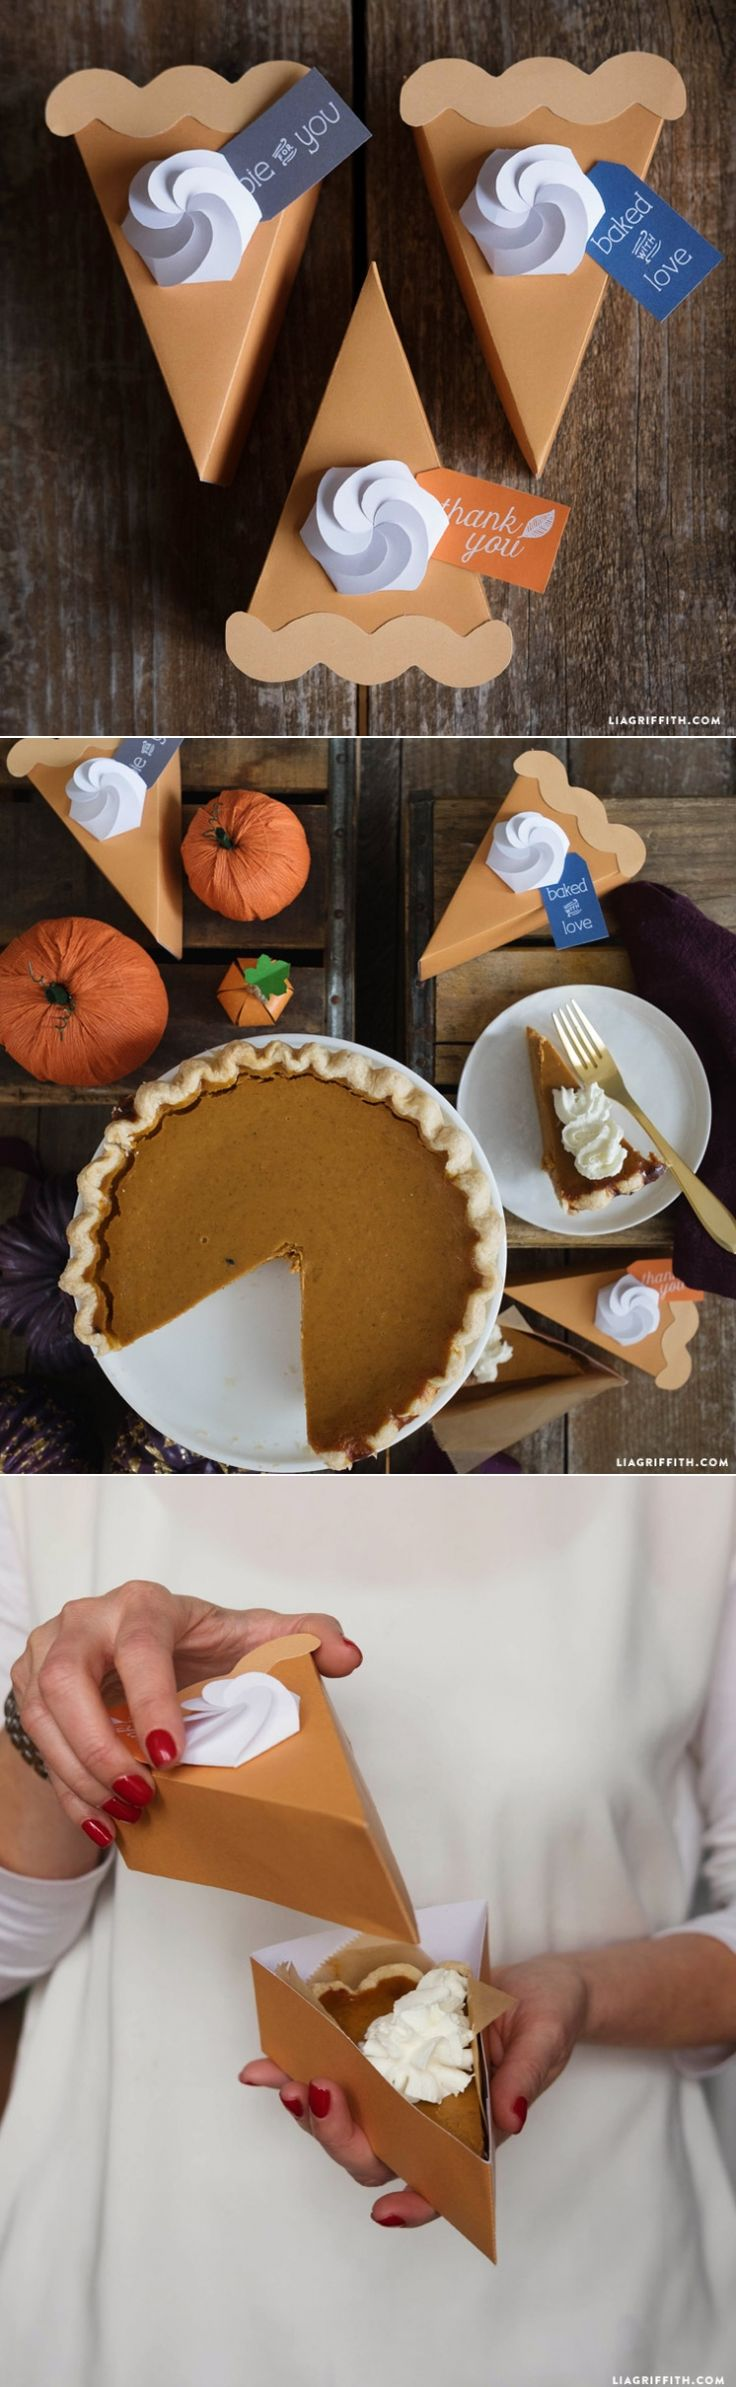 #PieToGo #ToGoBox #Thanksgiving #Papercraft www.LiaGriffith.com: